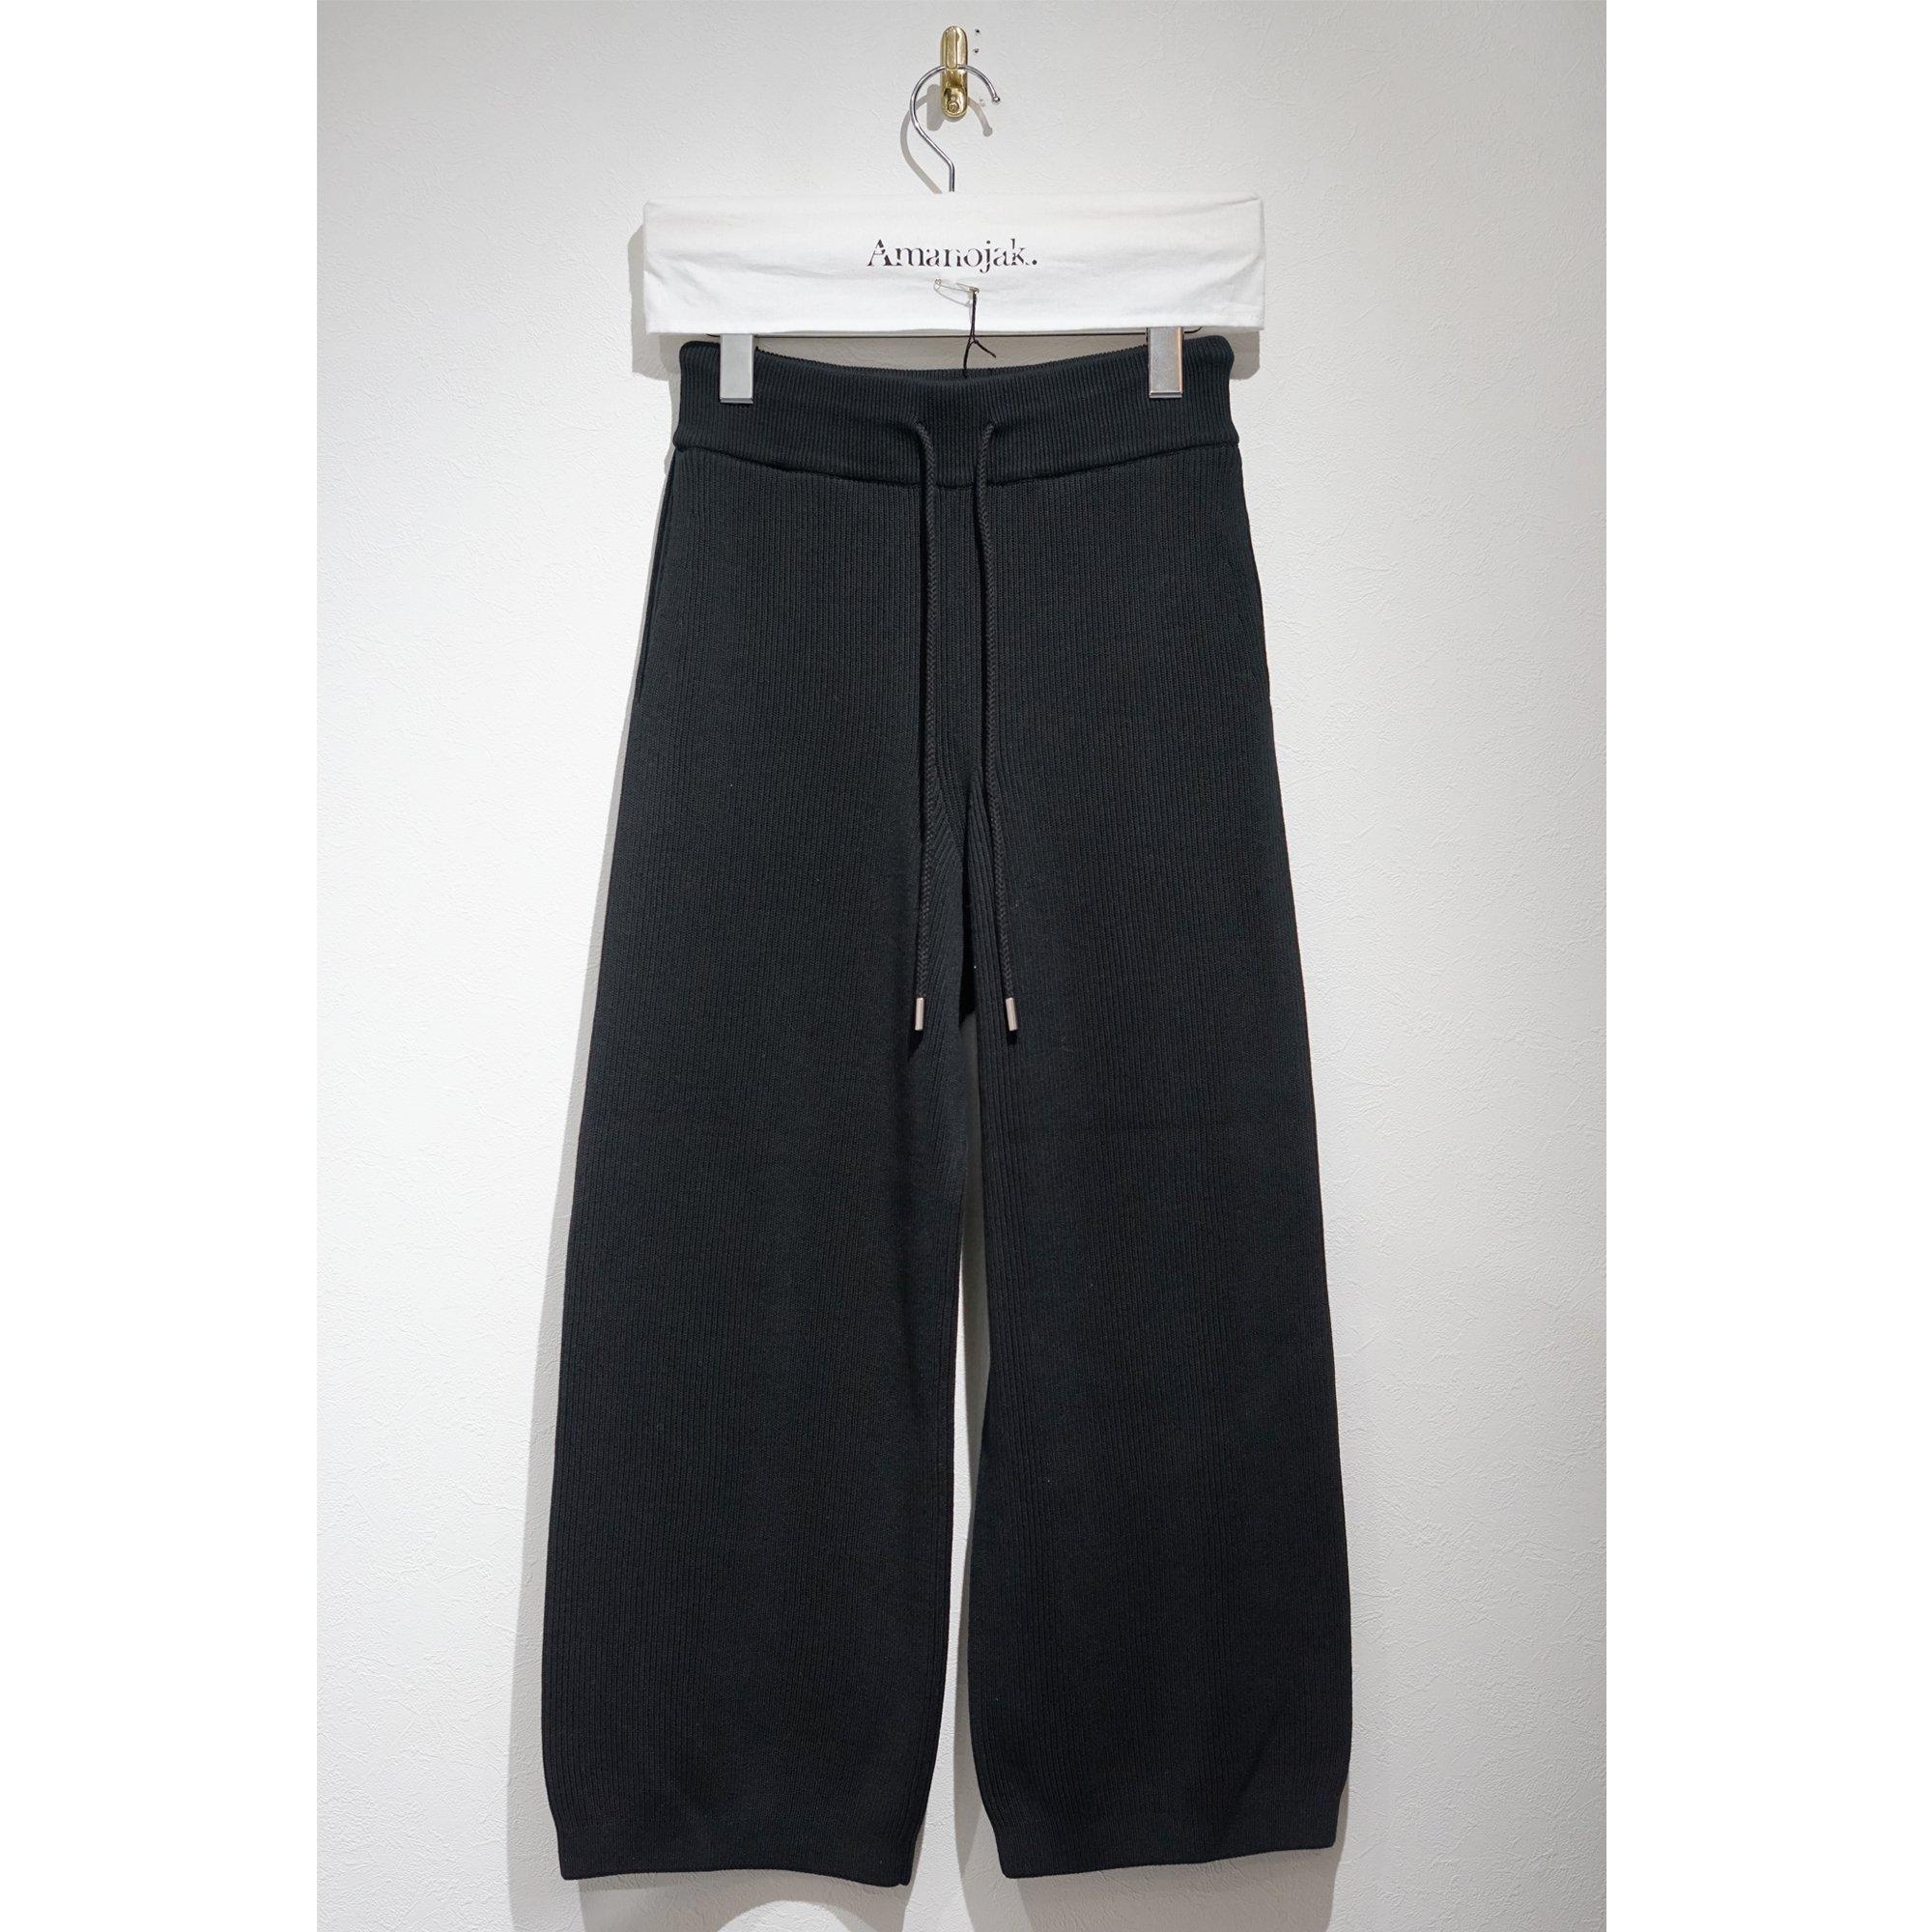 BATONER-FORM UP PANTS BLACK